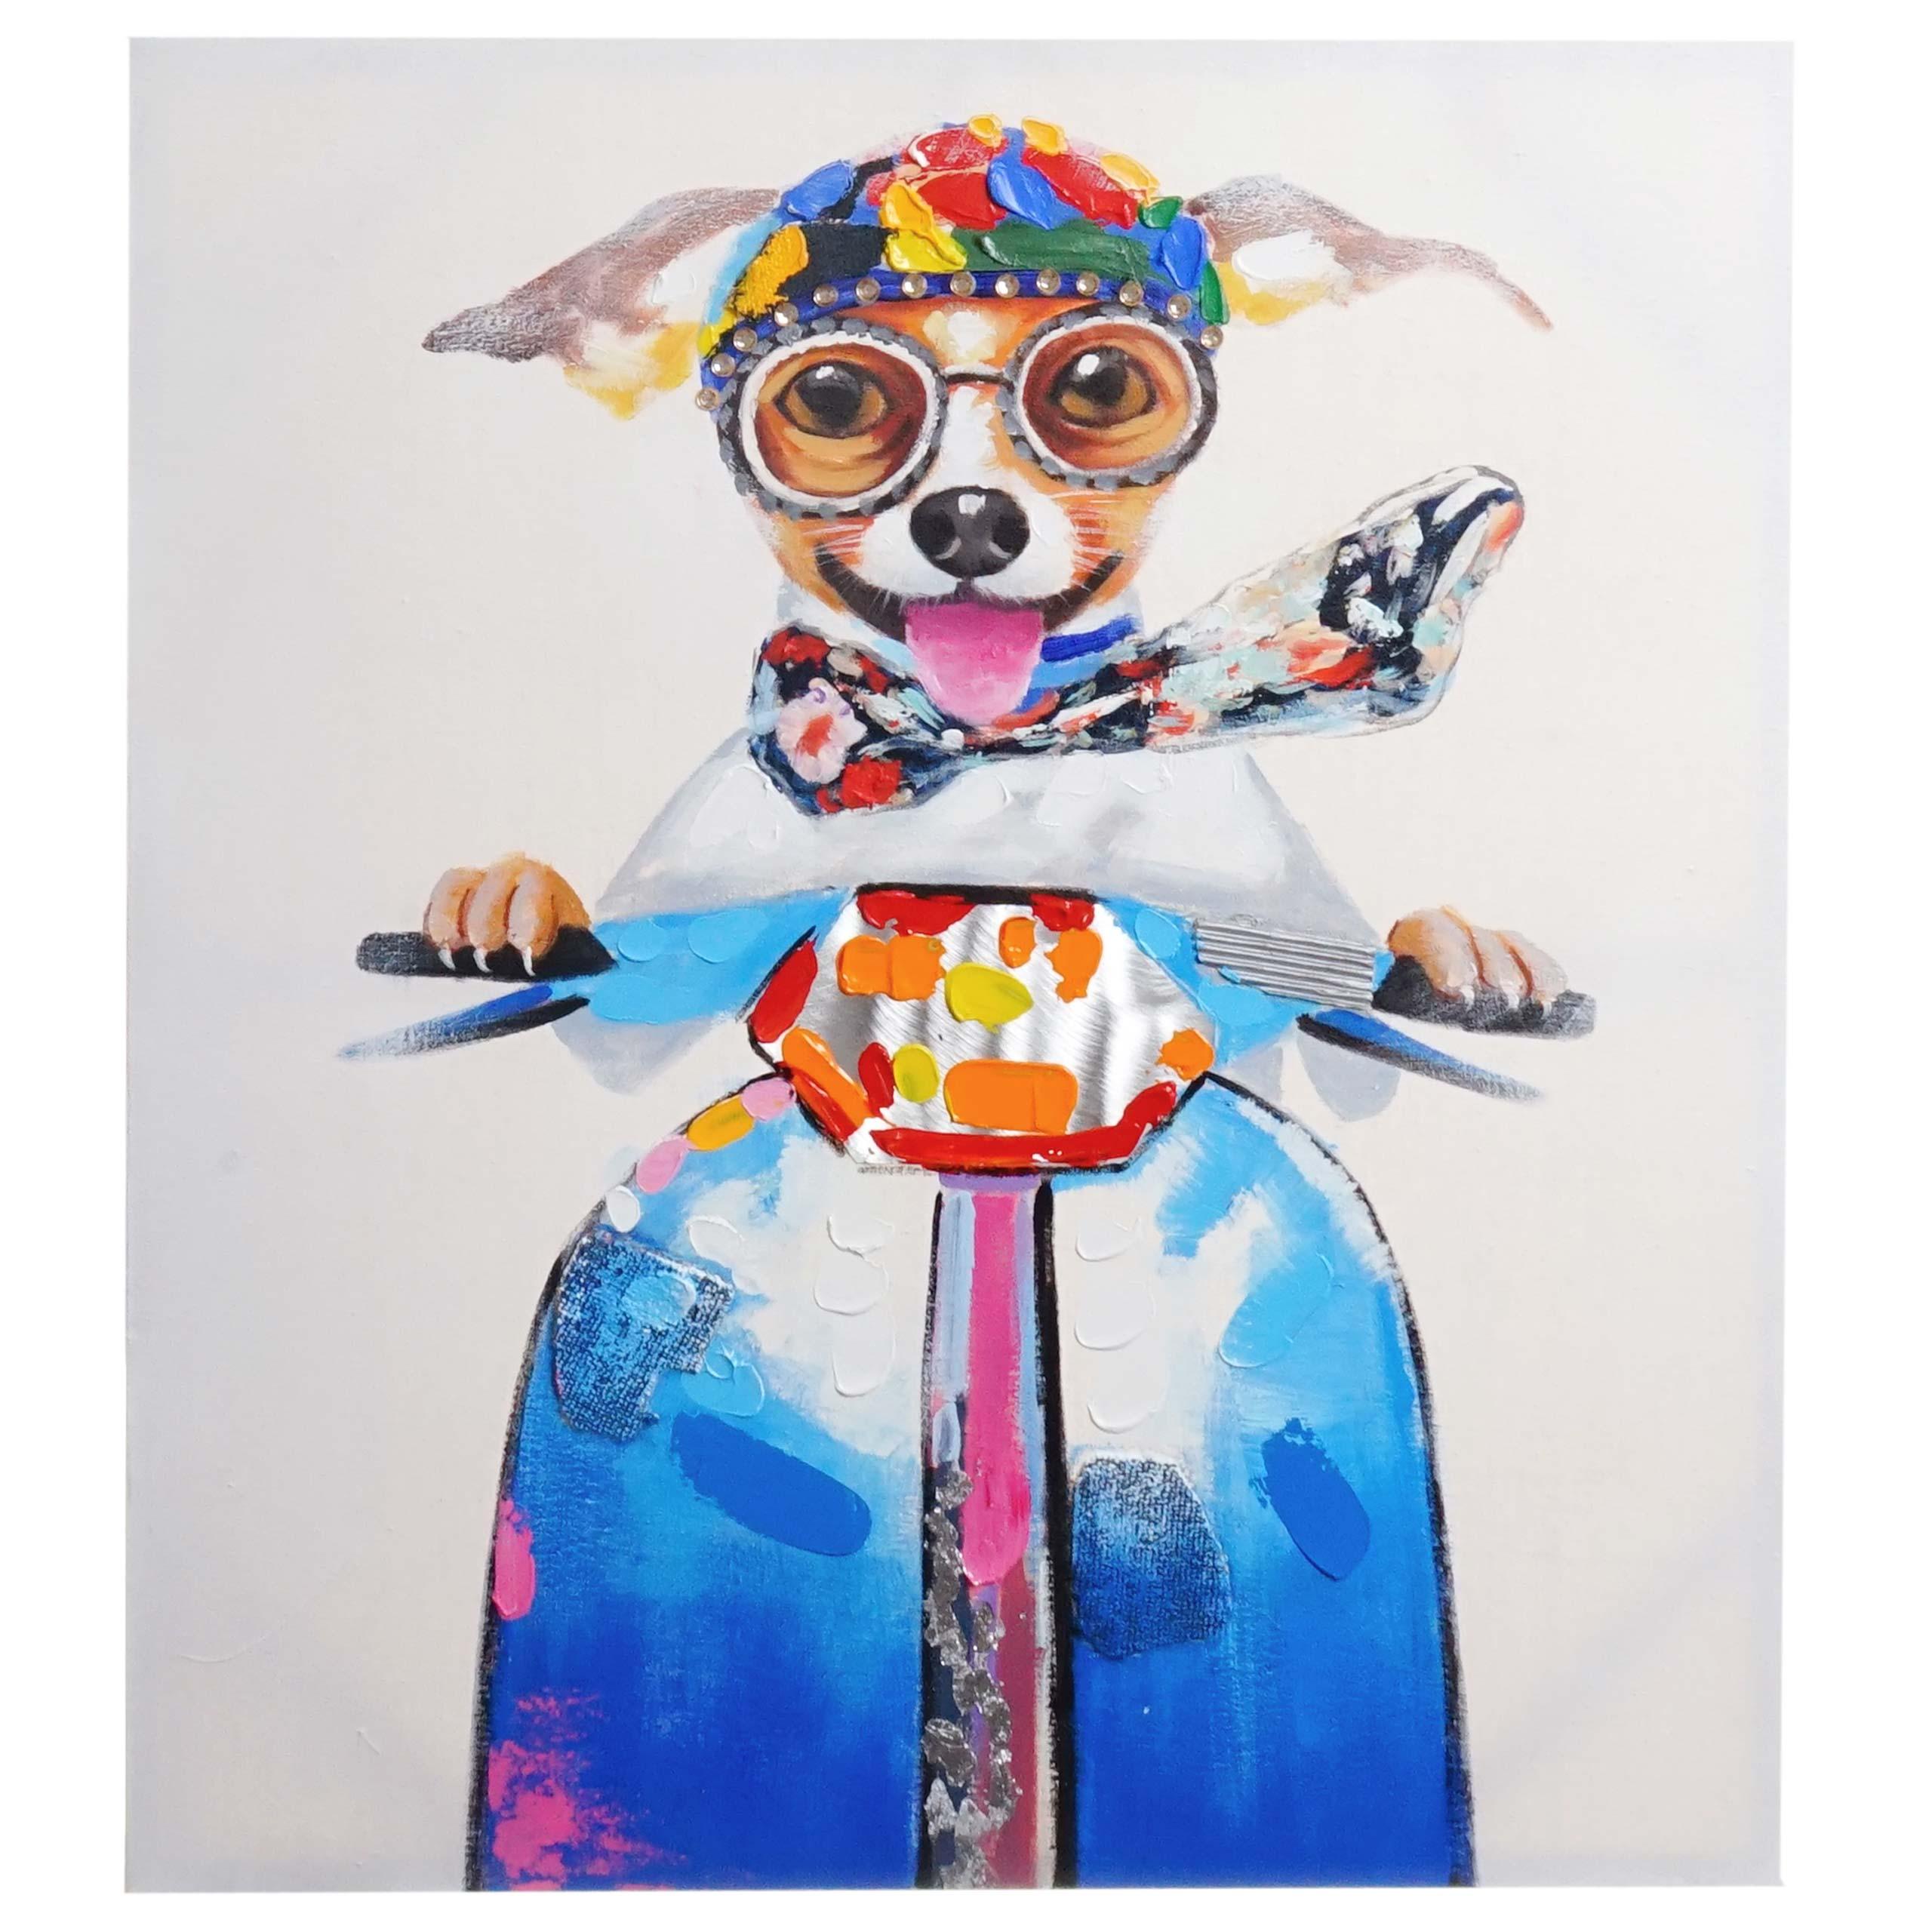 Mendler Ölgemälde Hund, 100% handgemaltes Wandbild 3D-Bild Gemälde XL, 100x90cm ~ Variantenangebot 44750